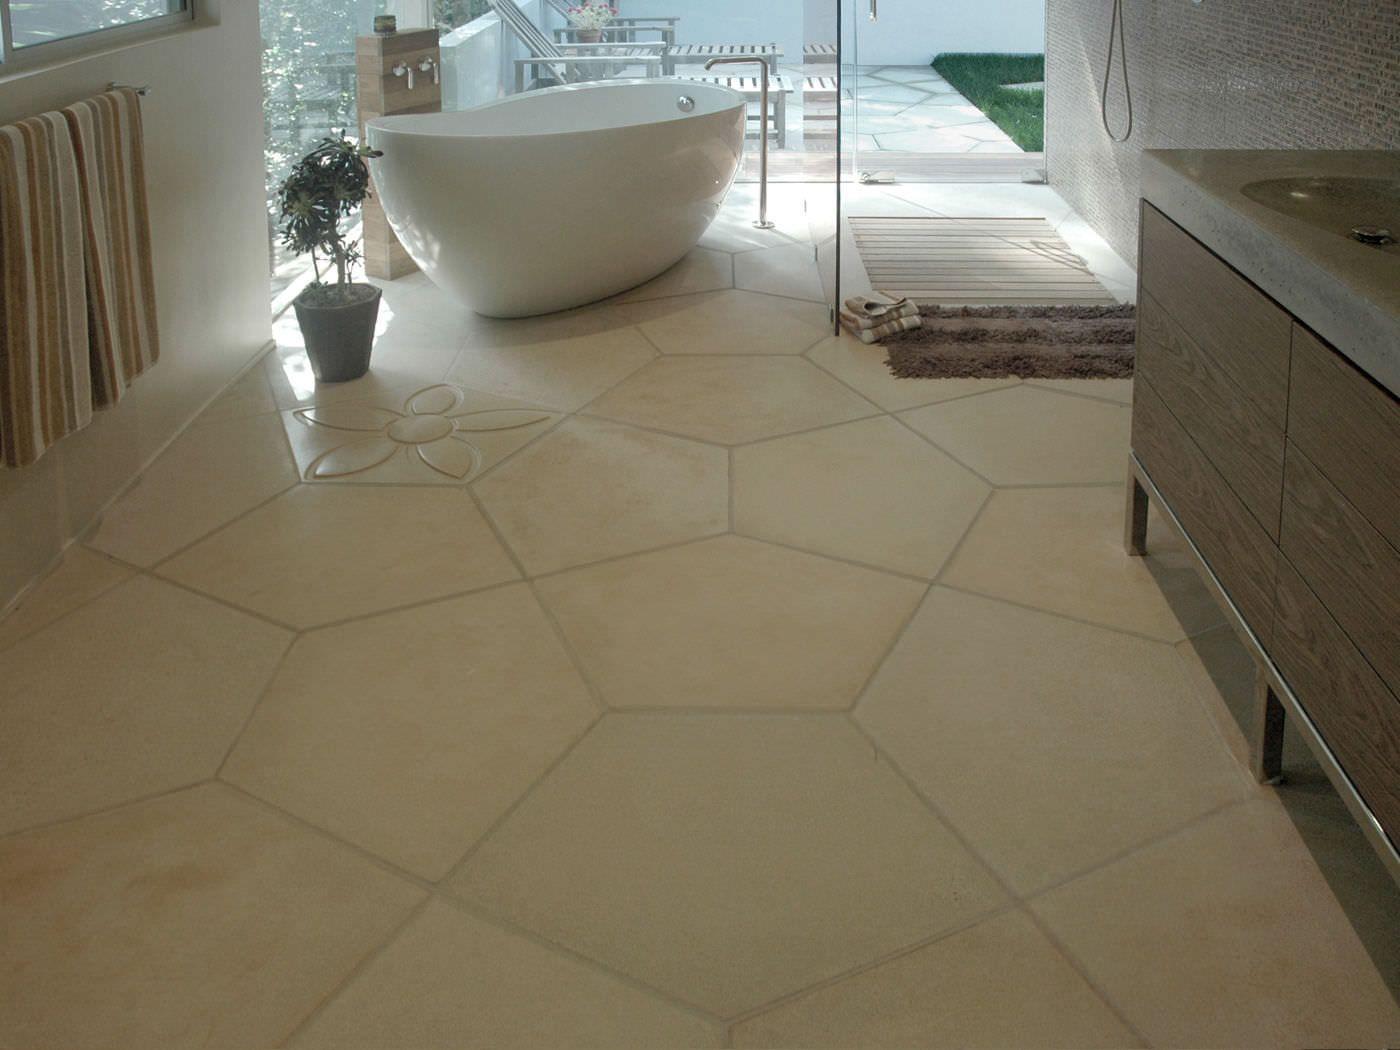 Floor tile outdoor concrete penta daniel ogassian moreno floor tile outdoor concrete penta daniel ogassian dailygadgetfo Images